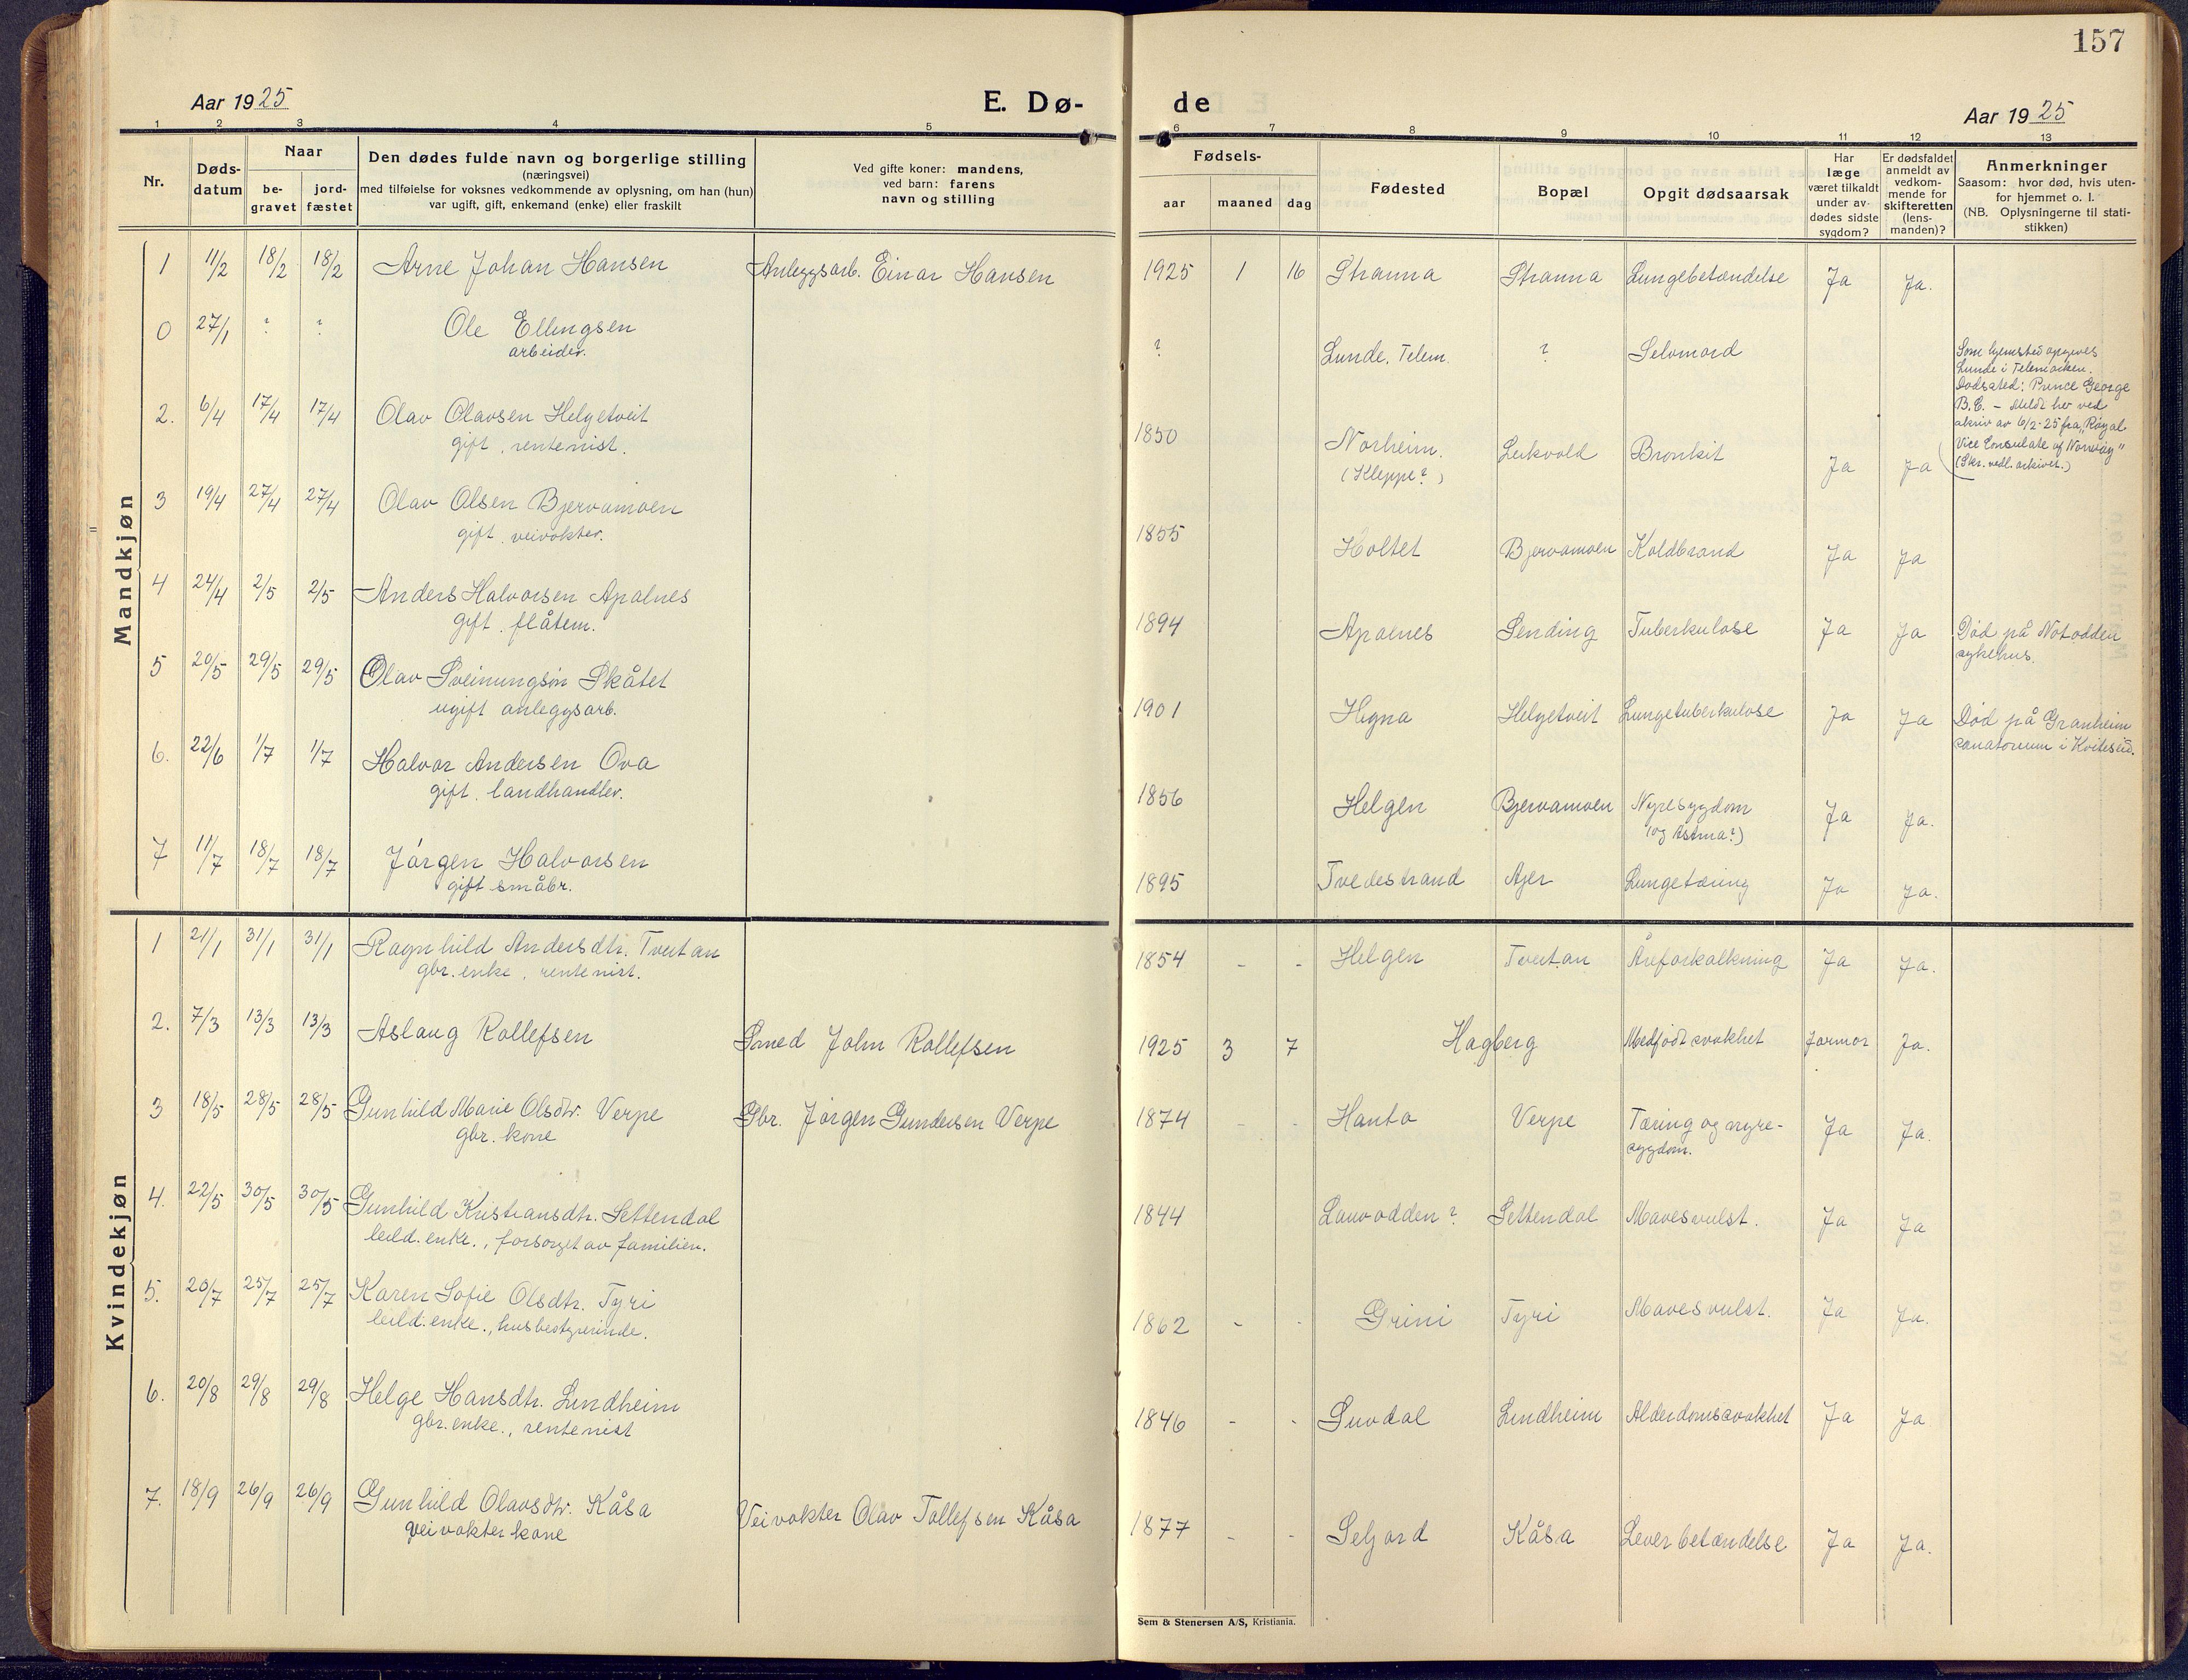 SAKO, Lunde kirkebøker, F/Fa/L0006: Ministerialbok nr. I 6, 1922-1940, s. 157